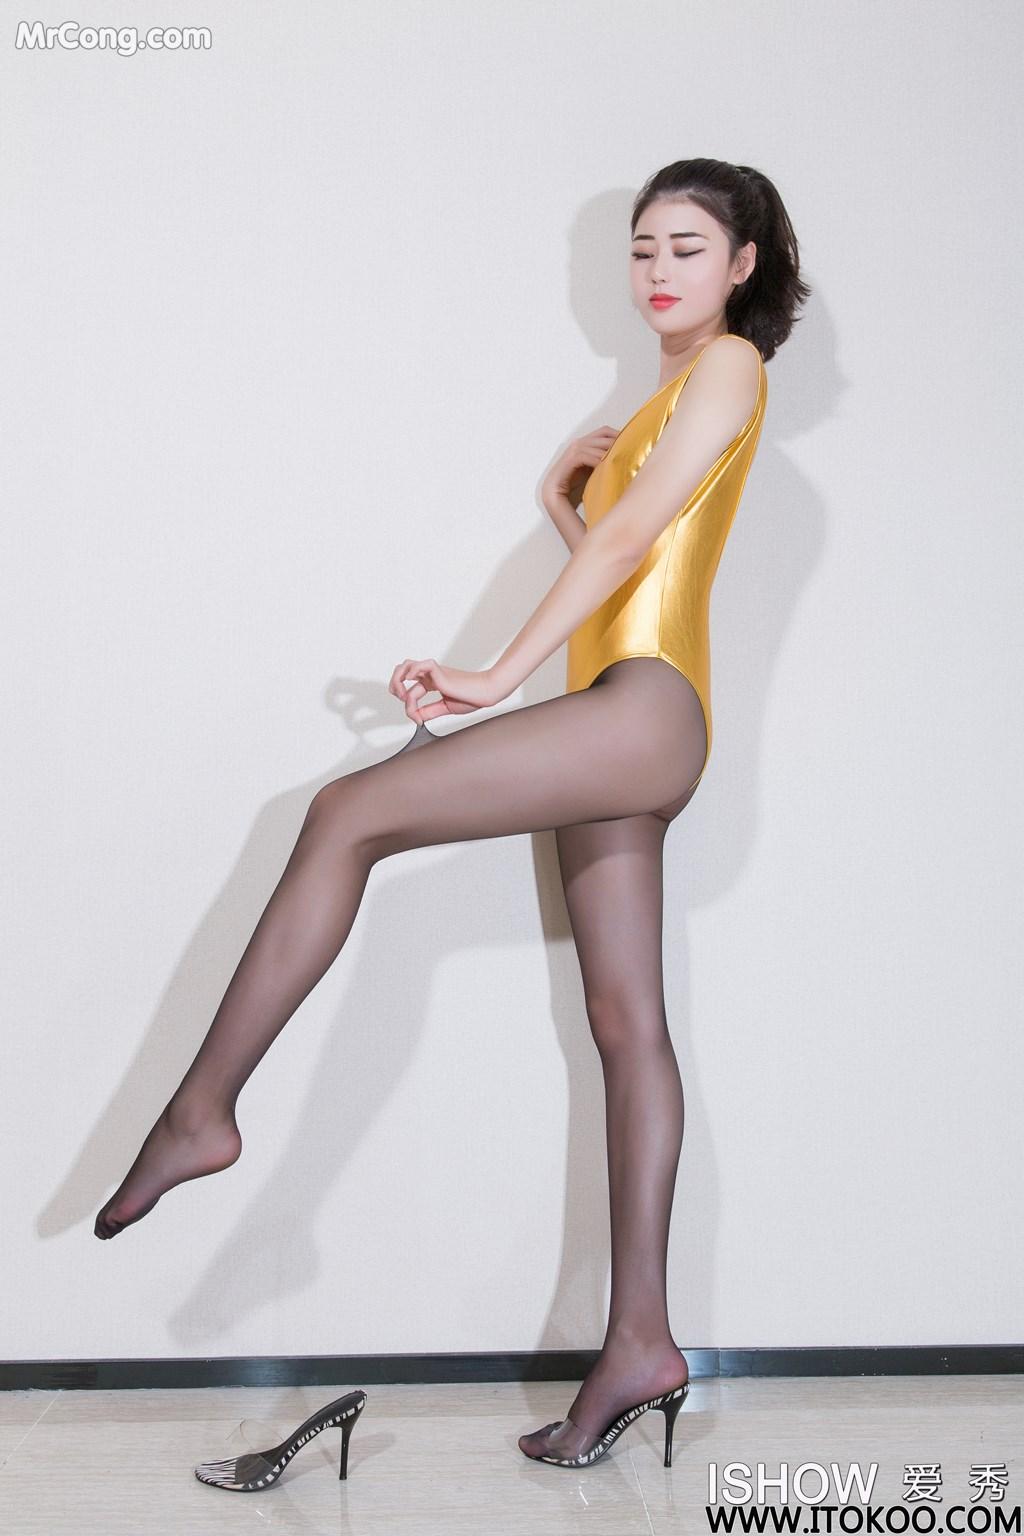 Image ISHOW-No.169-Liu-Yue-Fei-Phoebe-MrCong.com-004 in post ISHOW No.169: Người mẫu Liu Yue Fei (刘玥菲Phoebe) (31 ảnh)